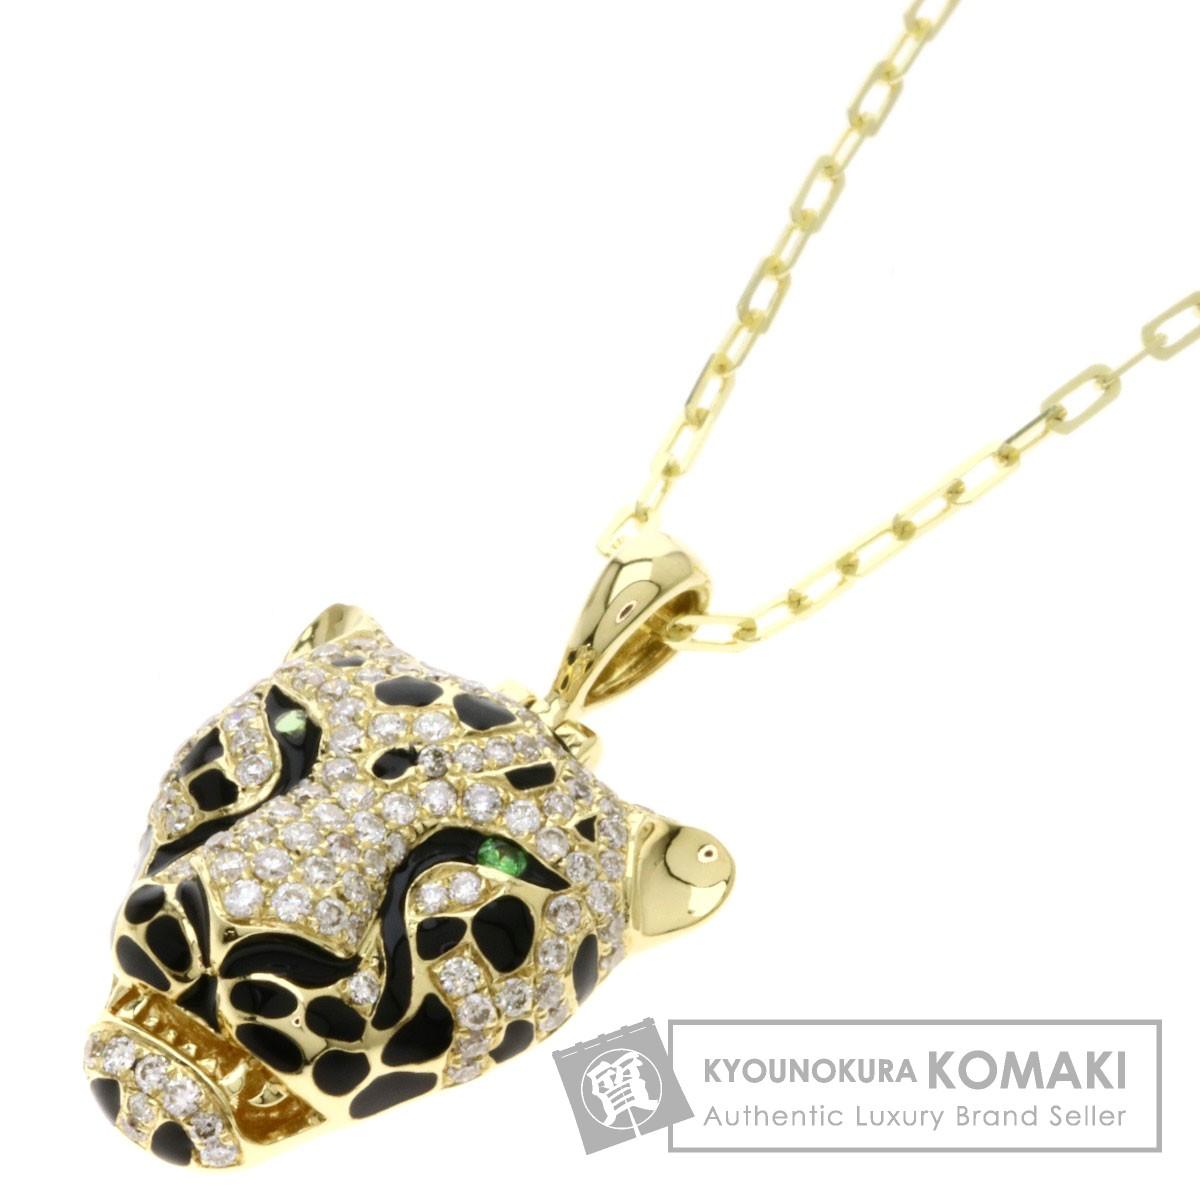 0.03ct 豹モチーフ/グリーンガーネット/ダイヤモンド ネックレス K18イエローゴールド 6.4g レディース 【中古】